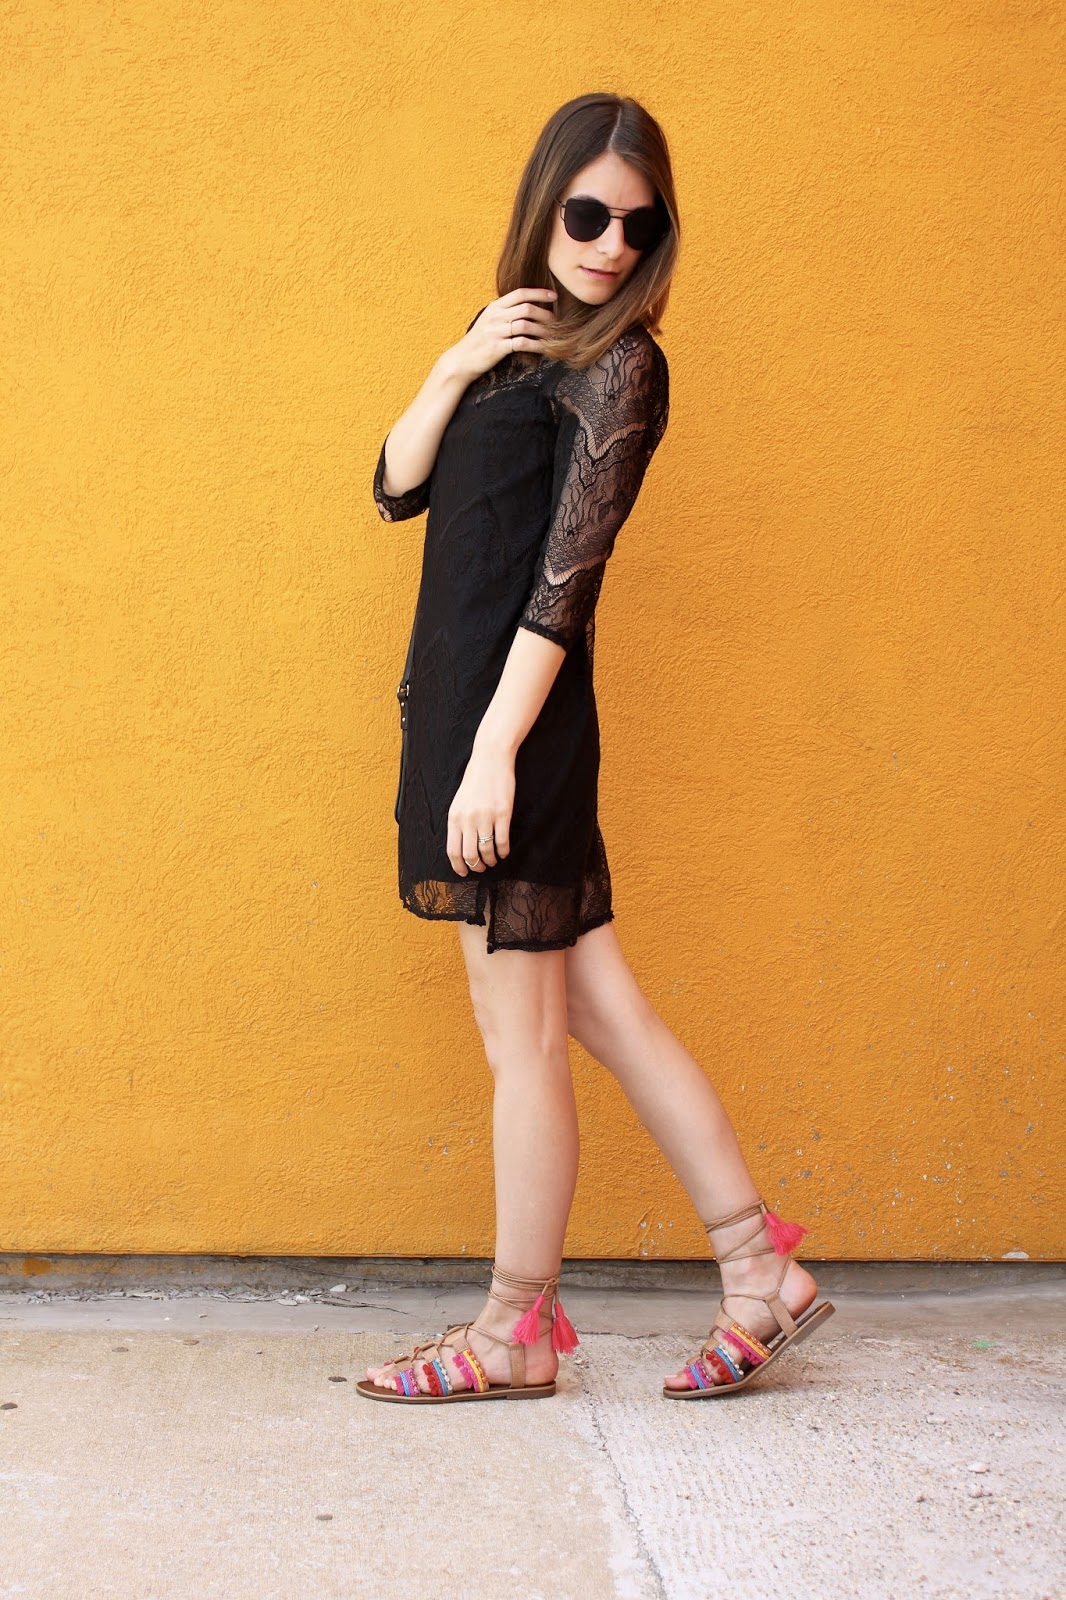 Black Dress and Neon Gladiators